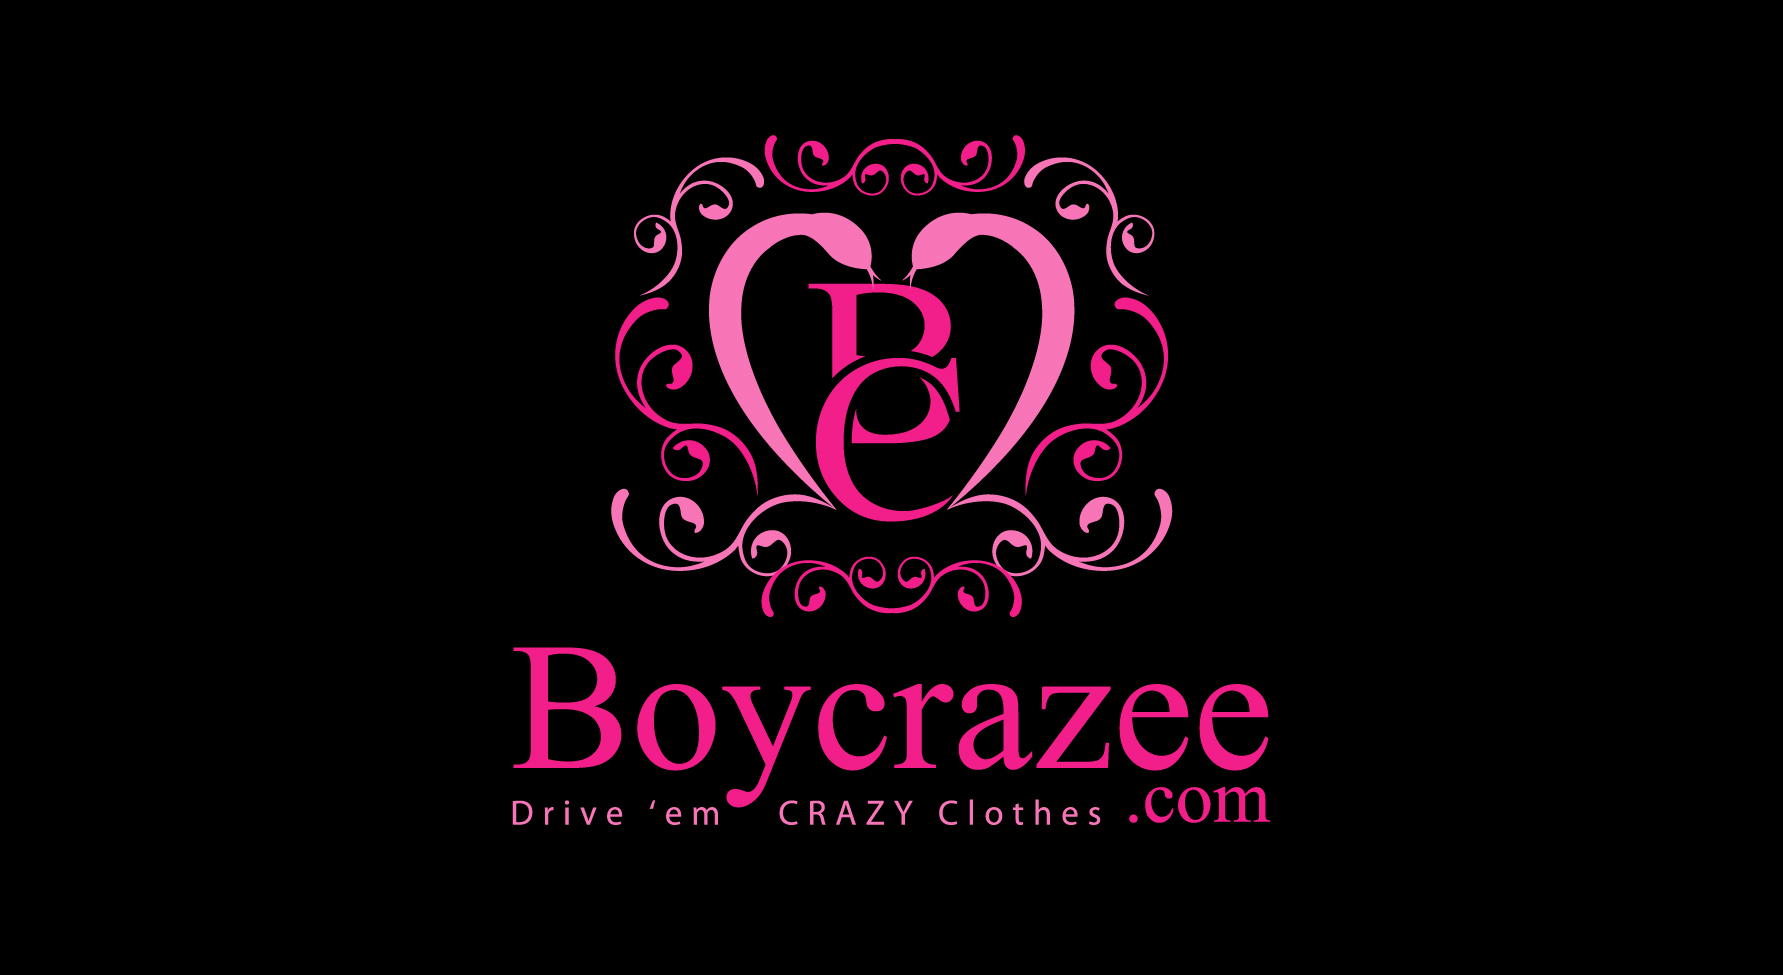 Boycrazee.com - Anaheim, CA